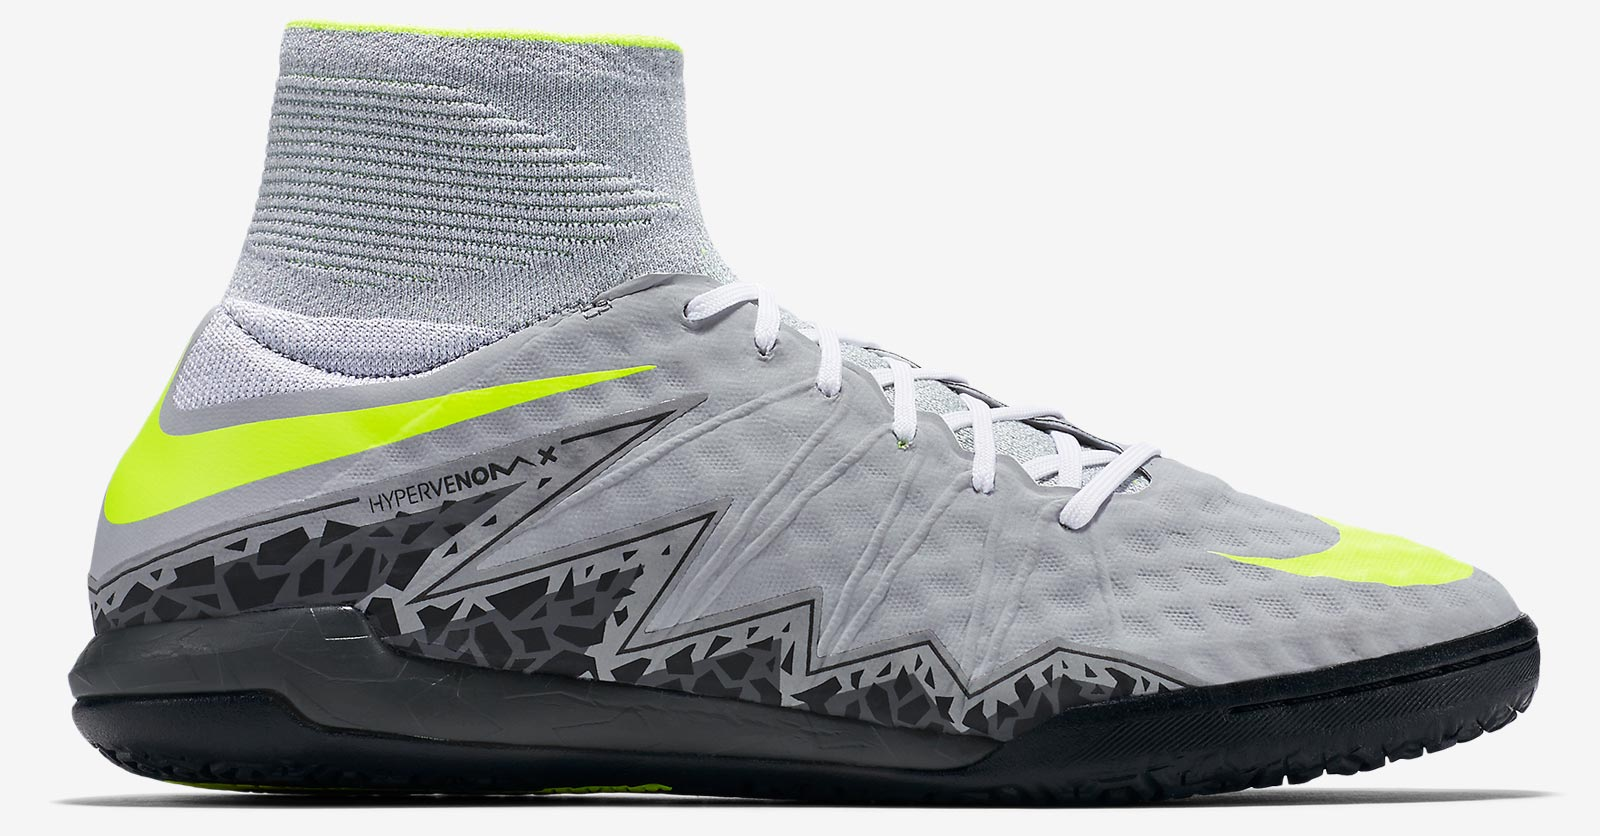 Wolf Grey Nike HypervenomX Proximo 2016-2017 Boots ...